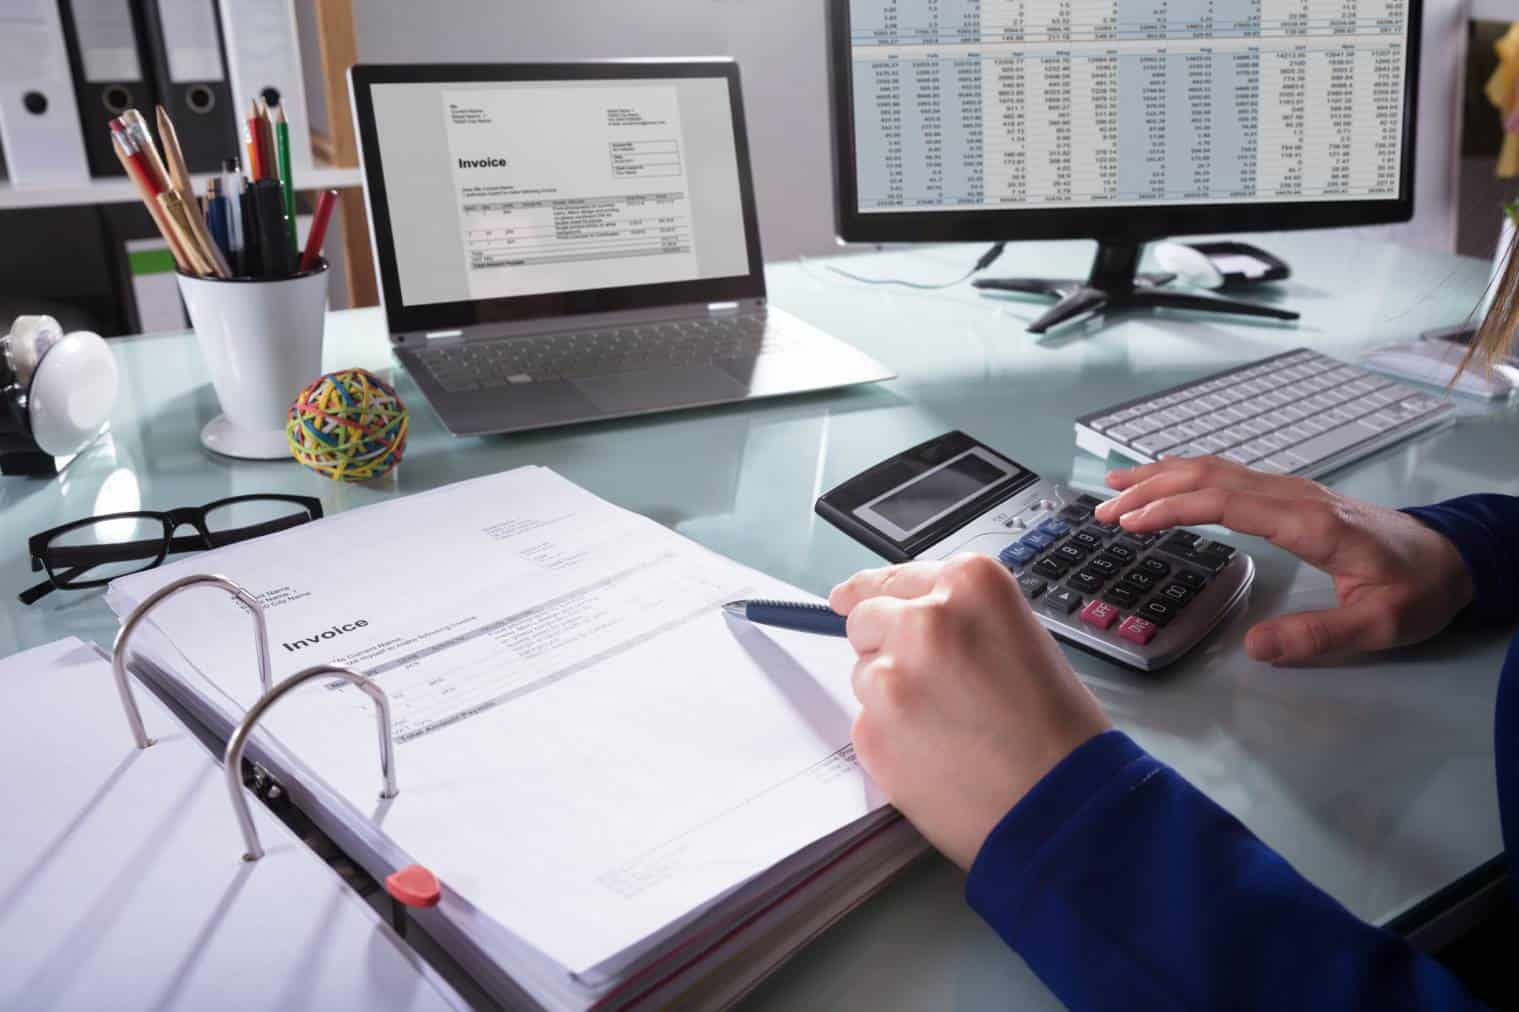 Mandatory electronic billing